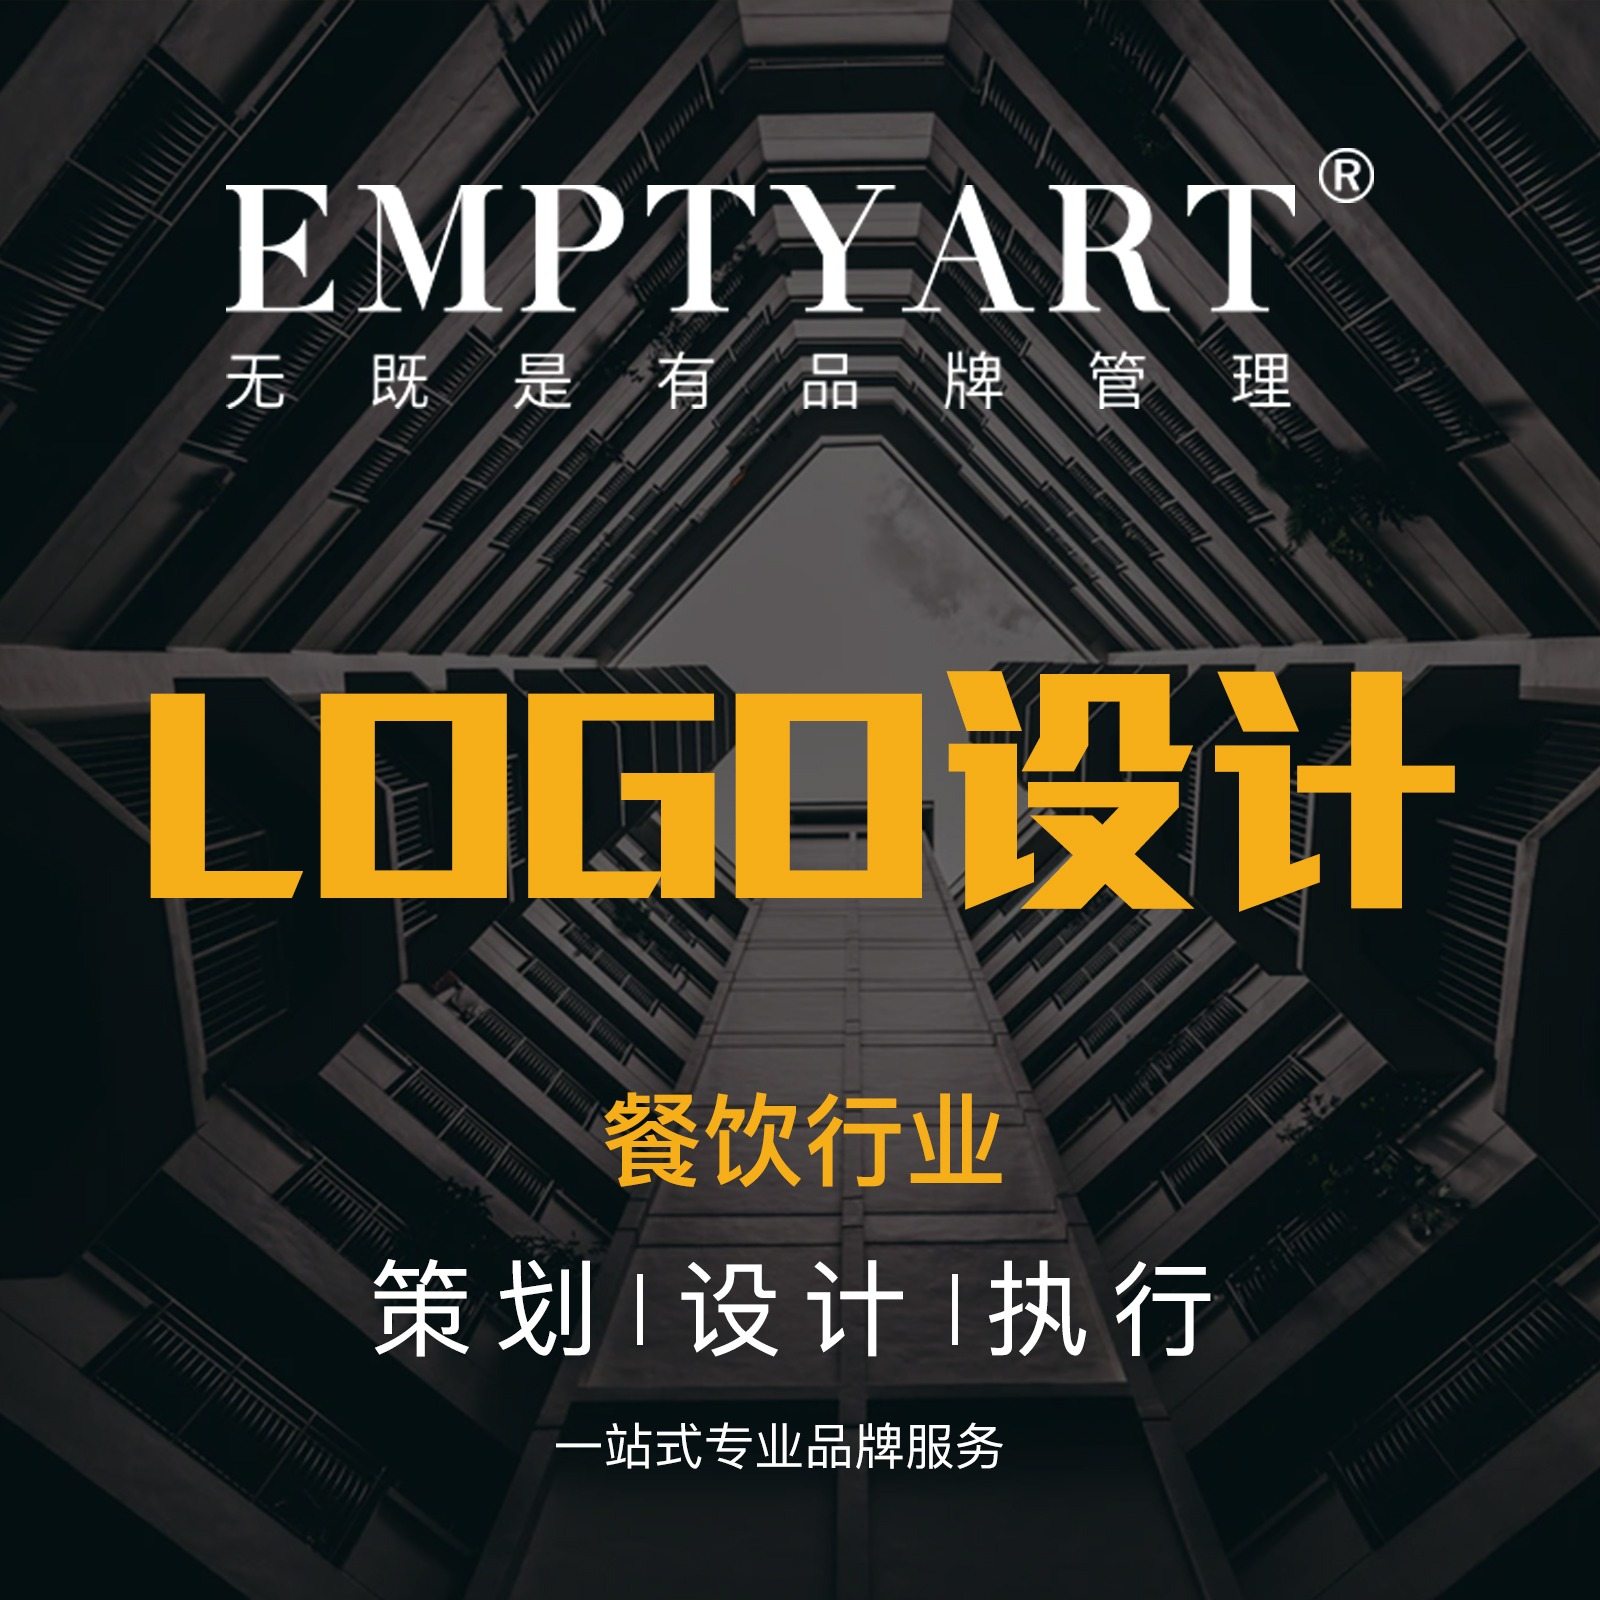 餐饮行业品牌<hl>logo设计</hl>原创标志商标<hl>LOGO</hl>图标